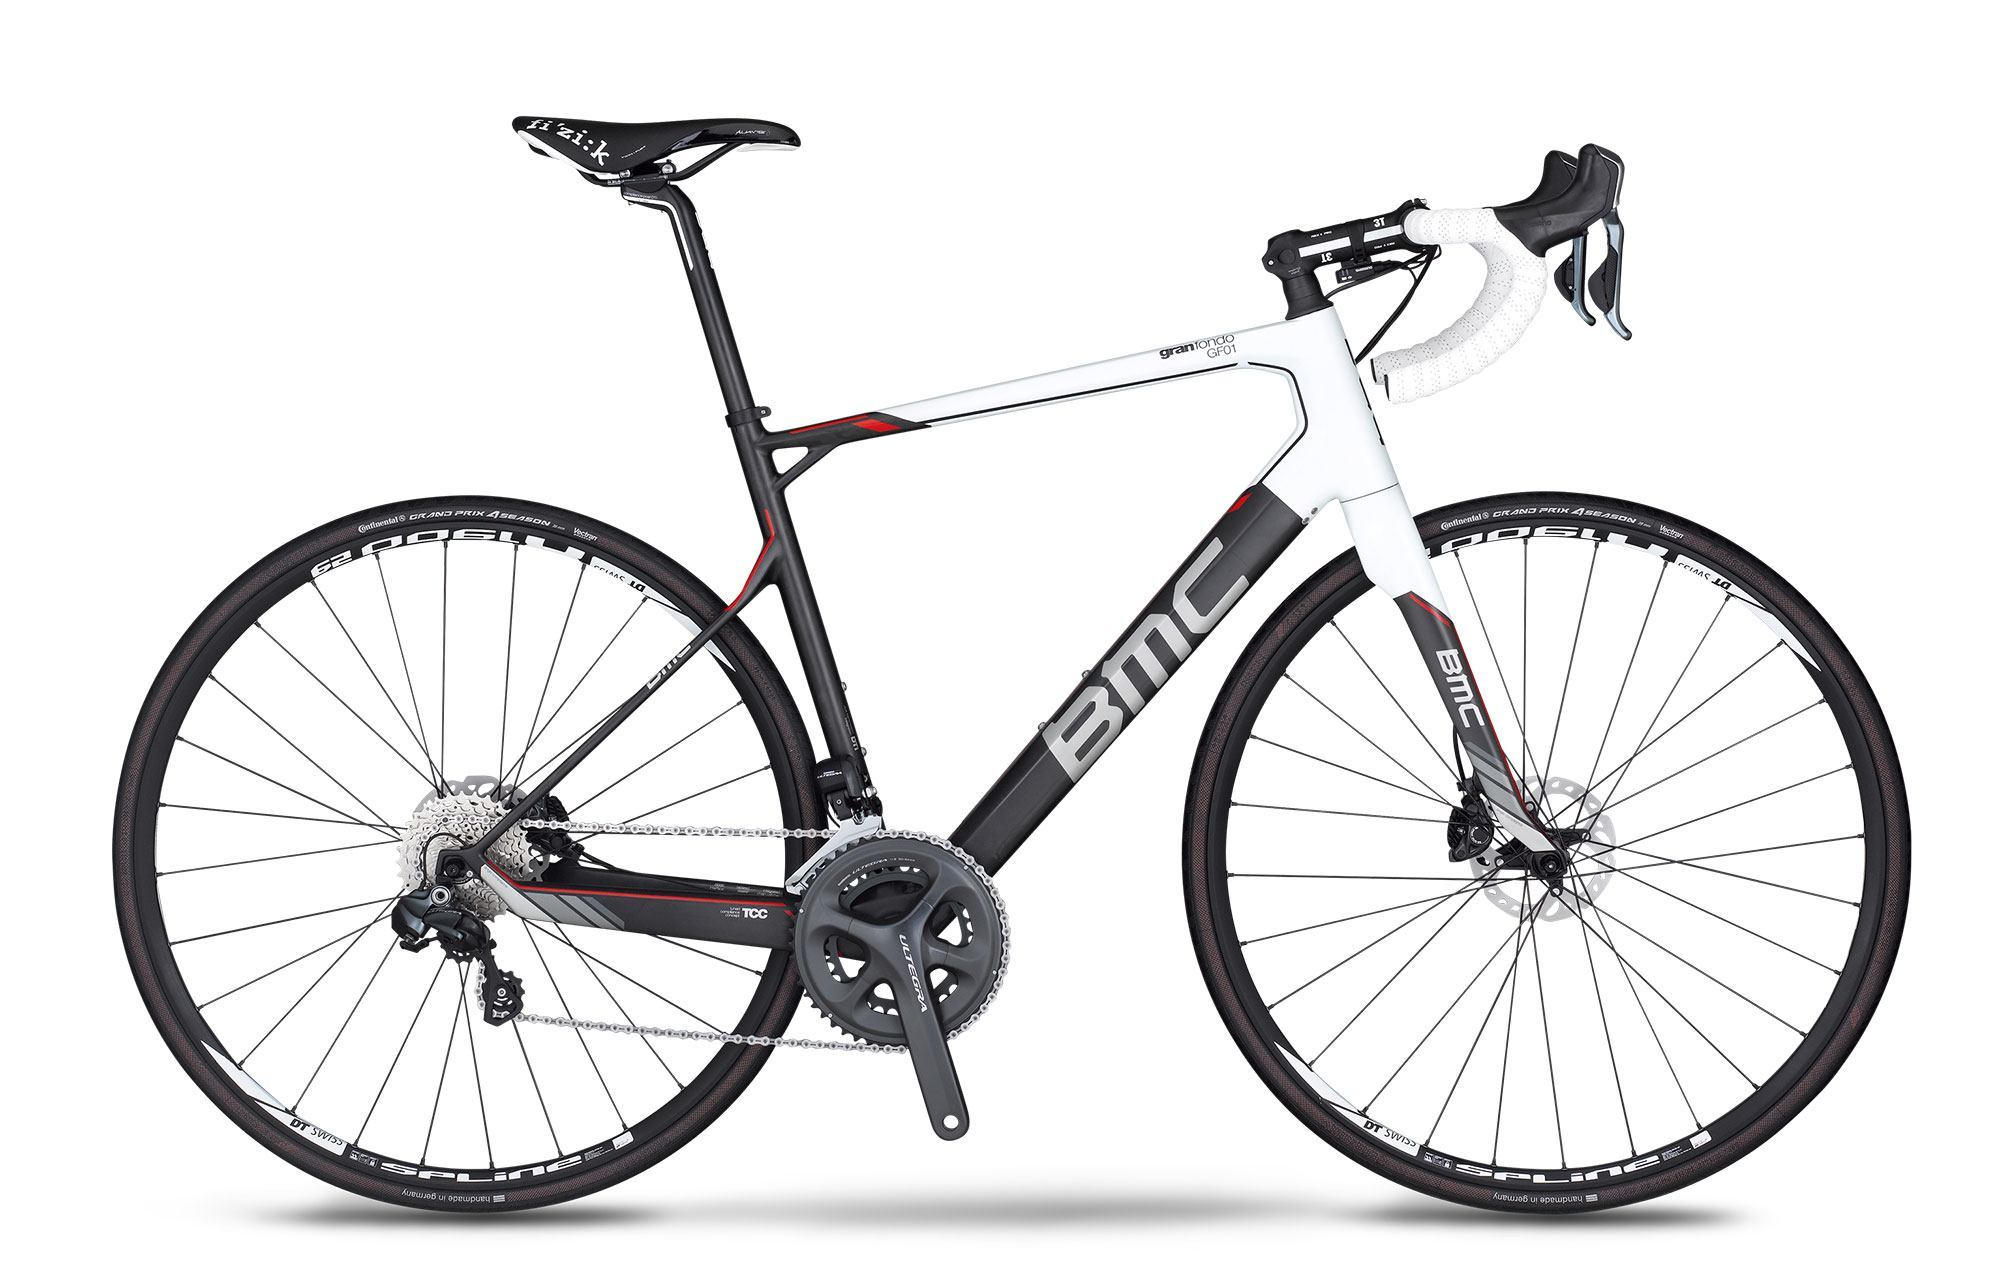 b0b89c1b2d7 2015 BMC GranFondo GF01 Disc Ultegra Di2 Bike | R&A Cycles